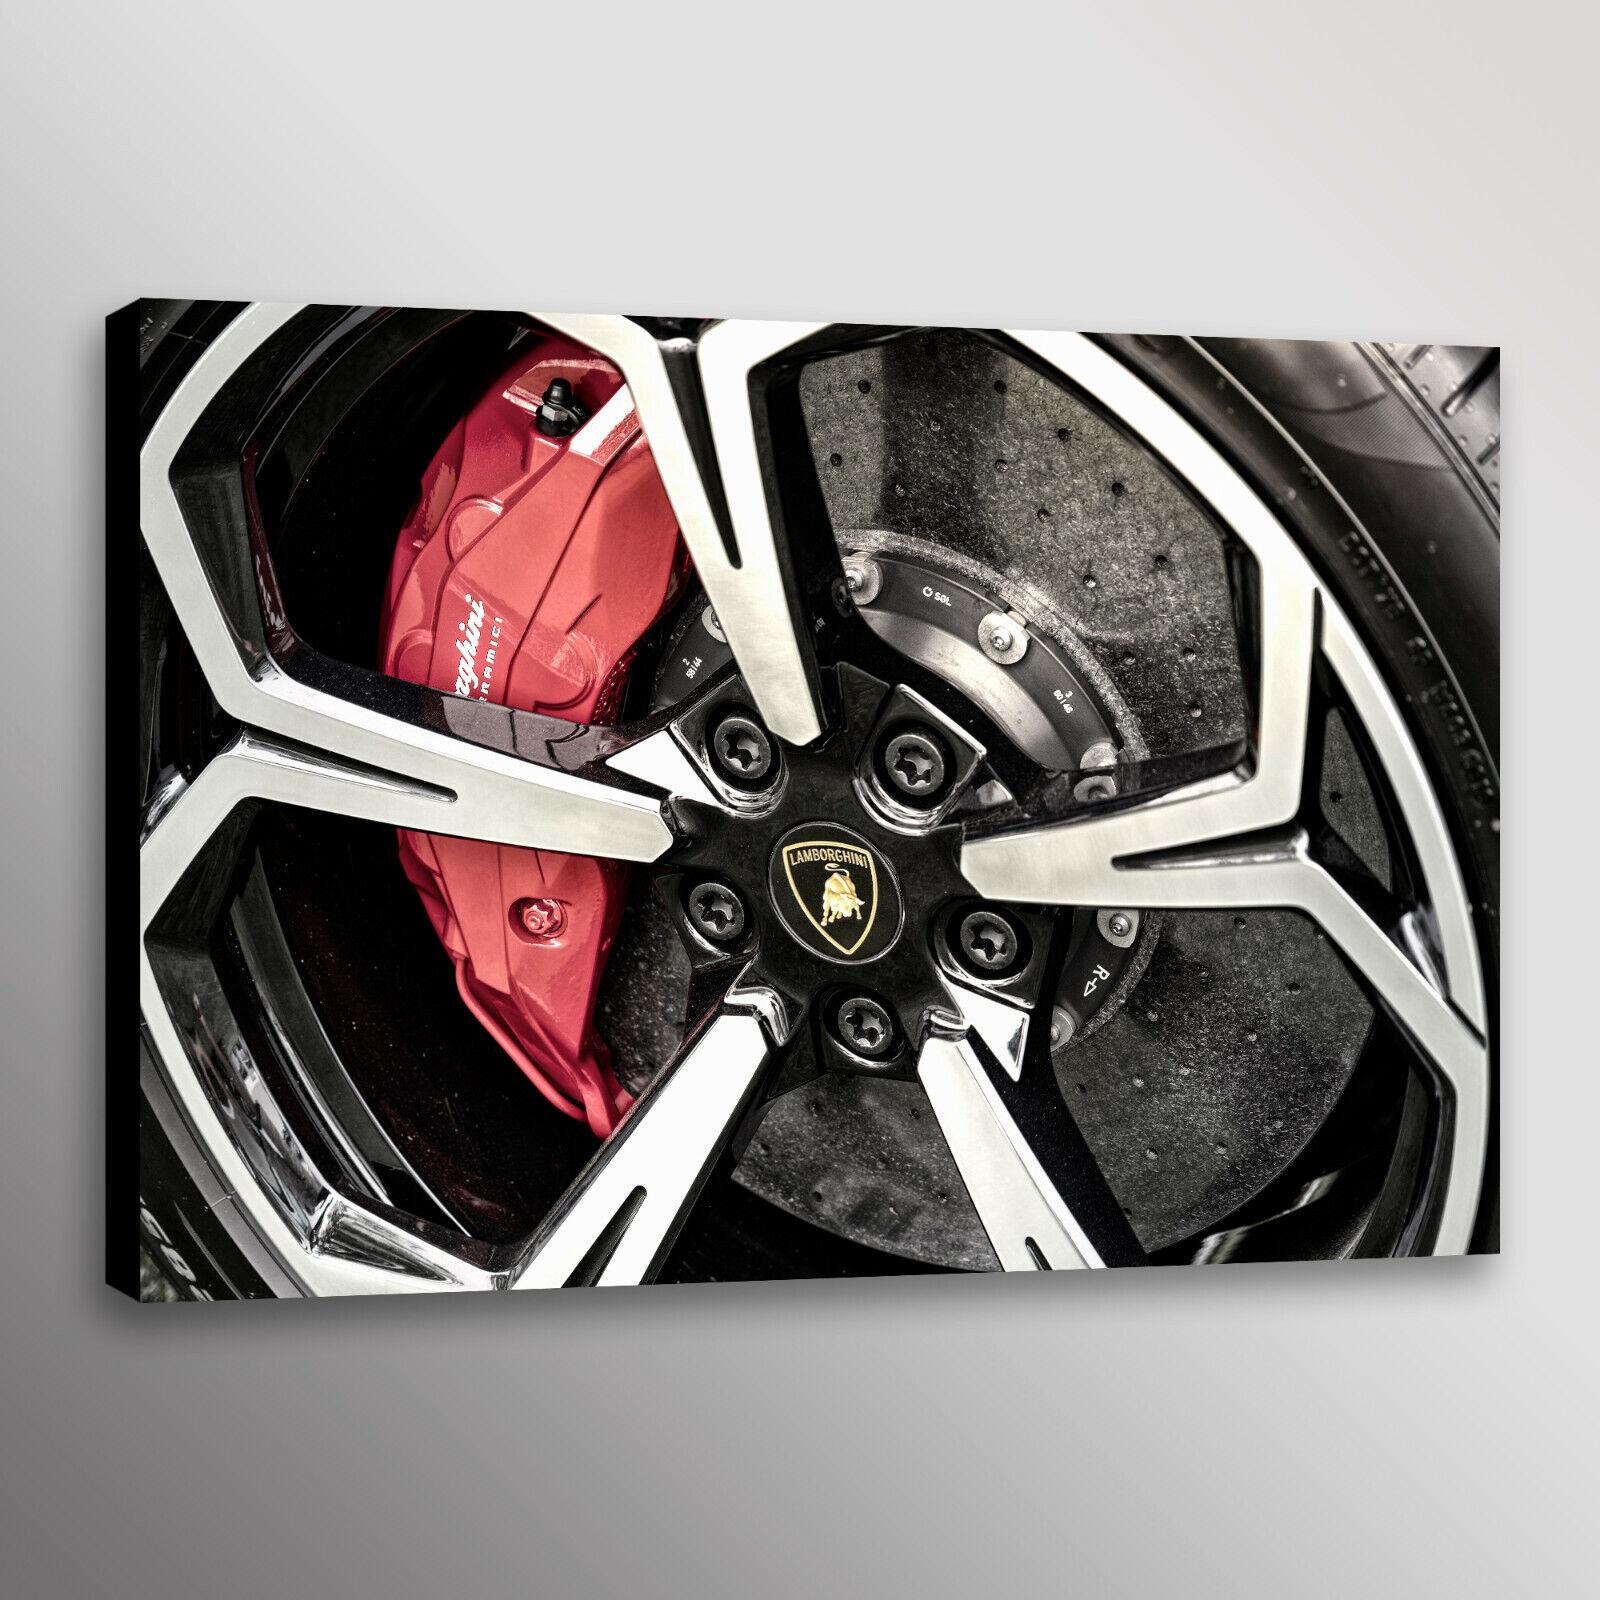 Lamborghini Wheel Brakes Racecar Automotive Car Photo Wand Kunst Canvas Drucken